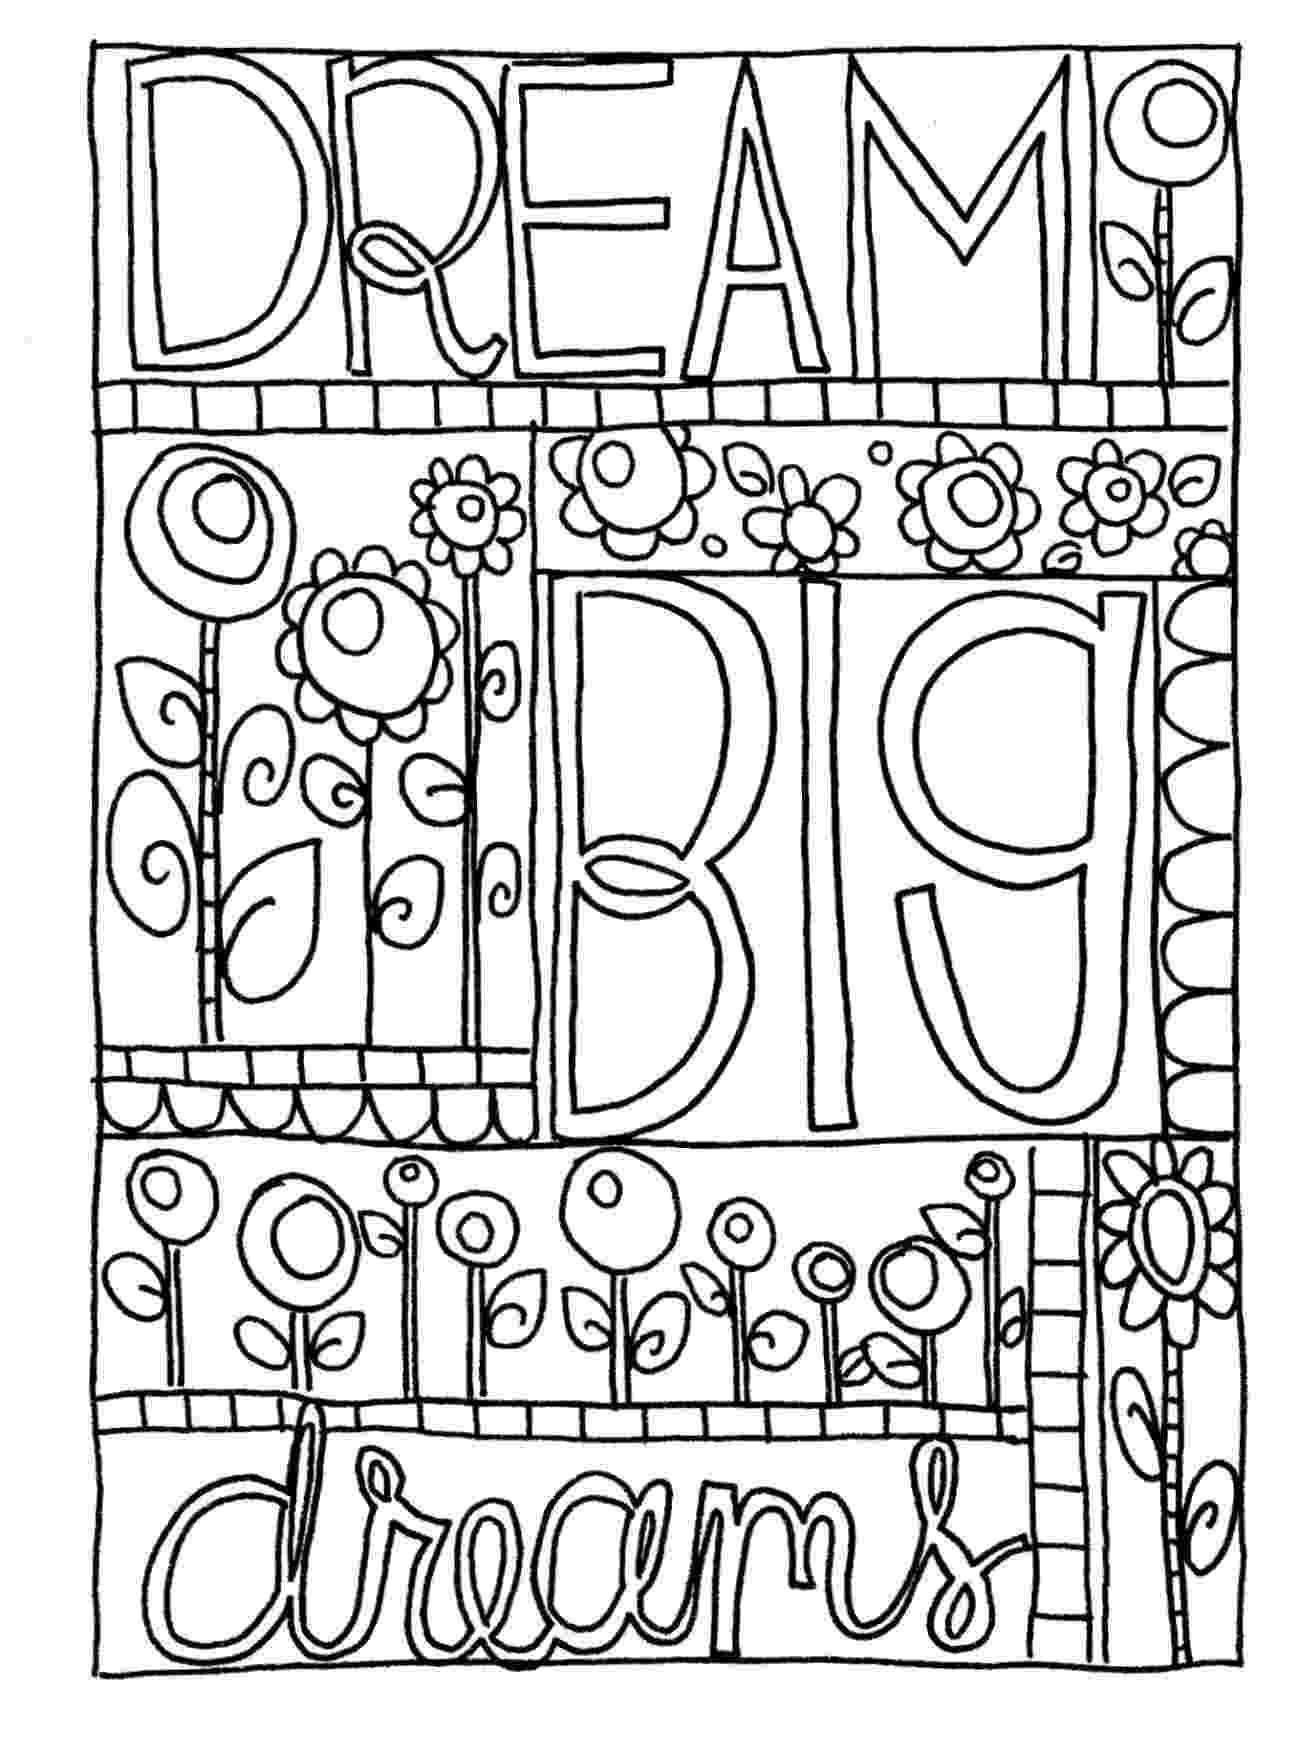 doodle art coloring book doodle art alley quotes quotesgram doodle art coloring book